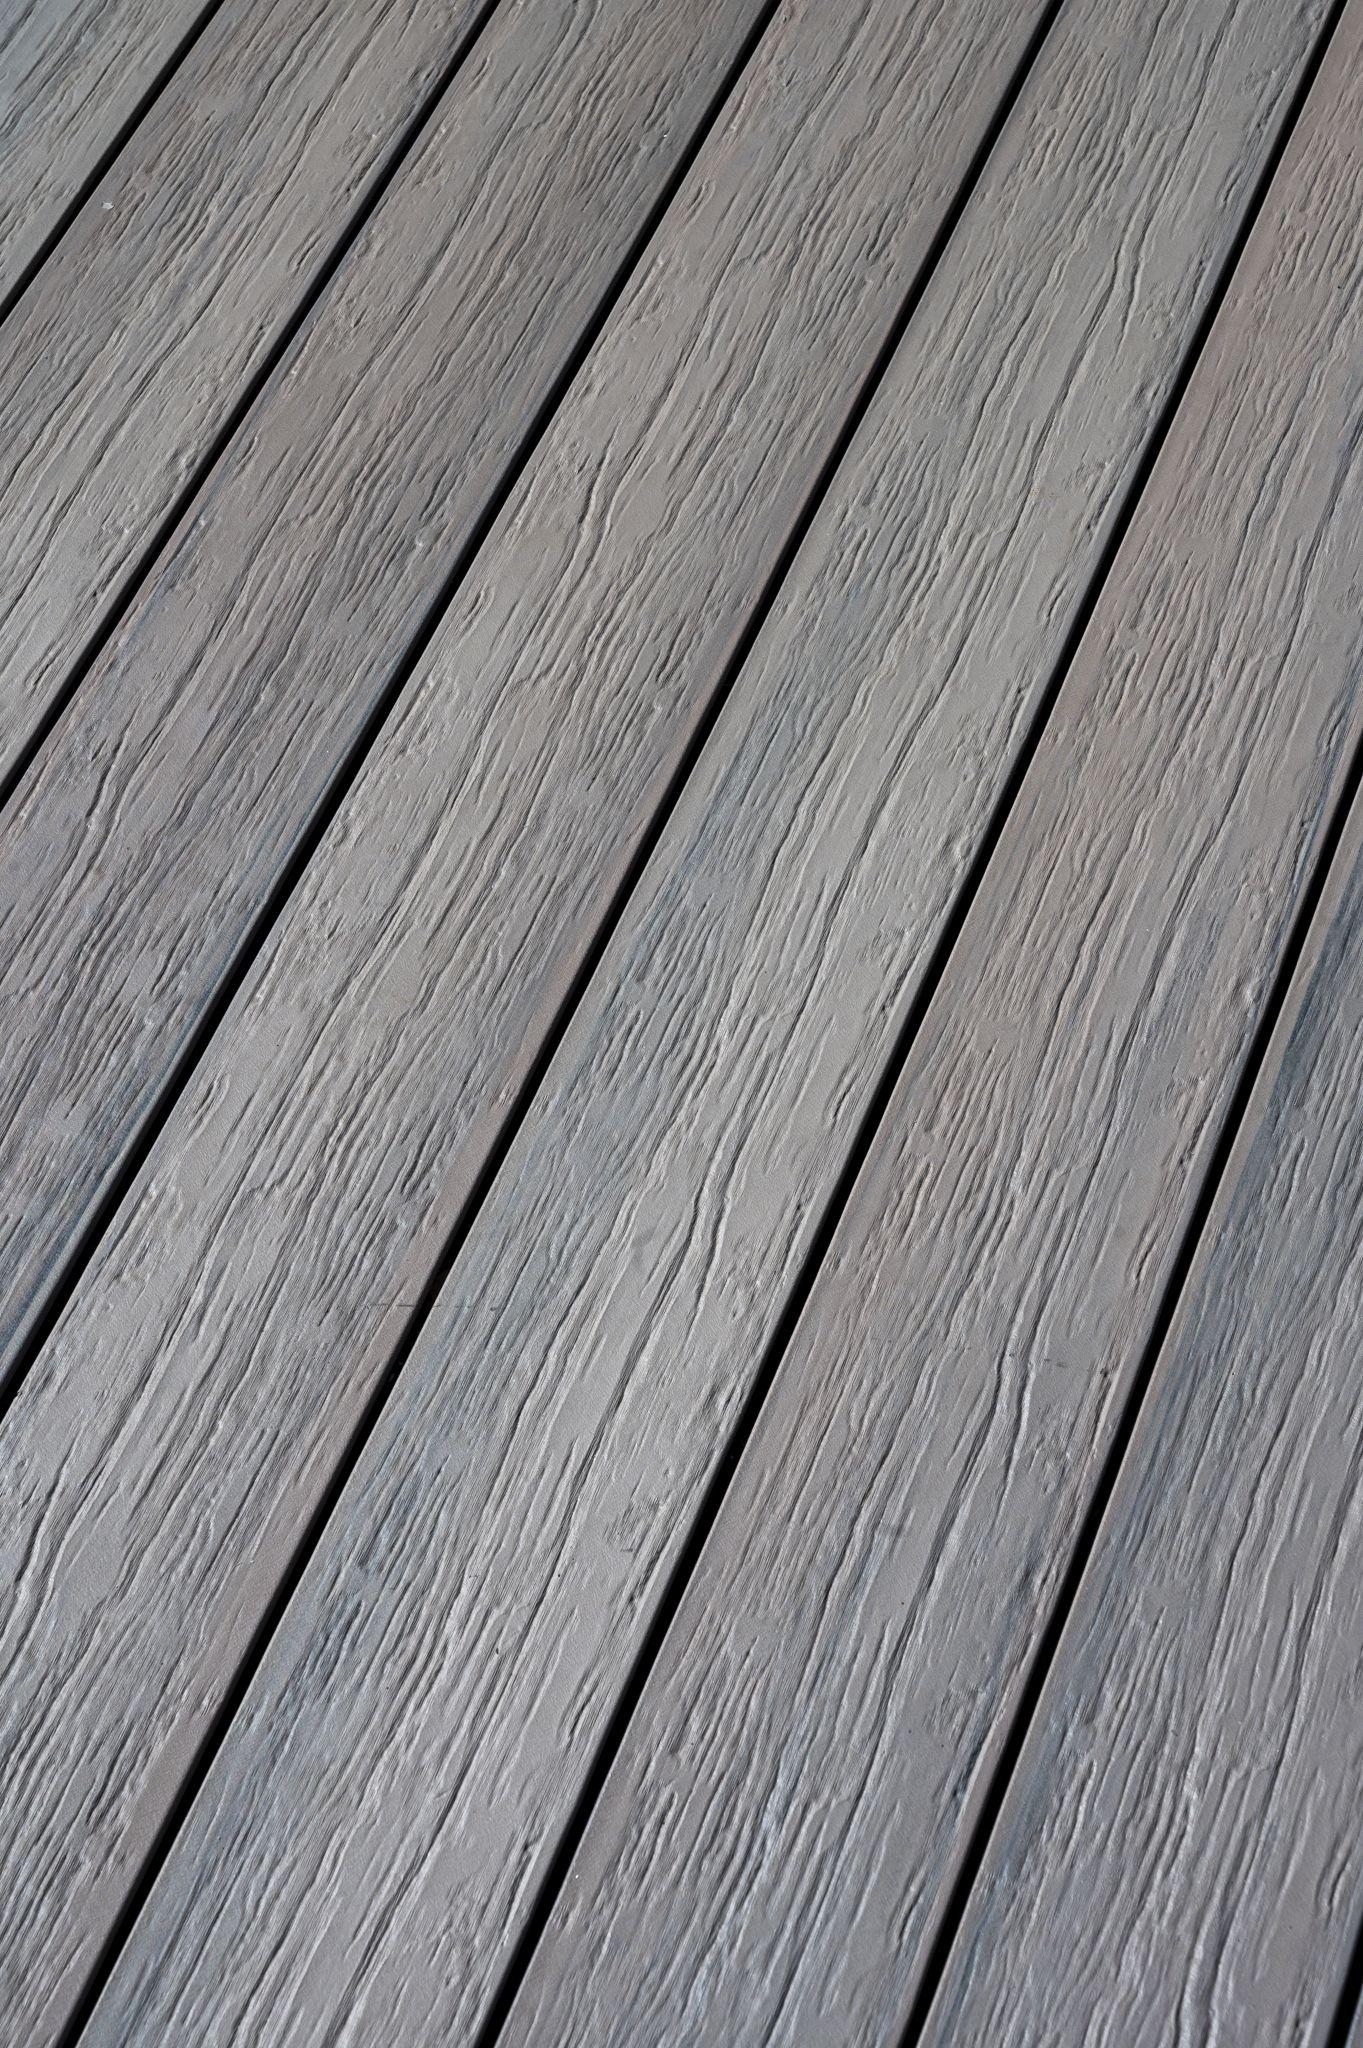 Wpc Bpc Terrassendiele Zweifarbig Massivprofil 20x140mm Co